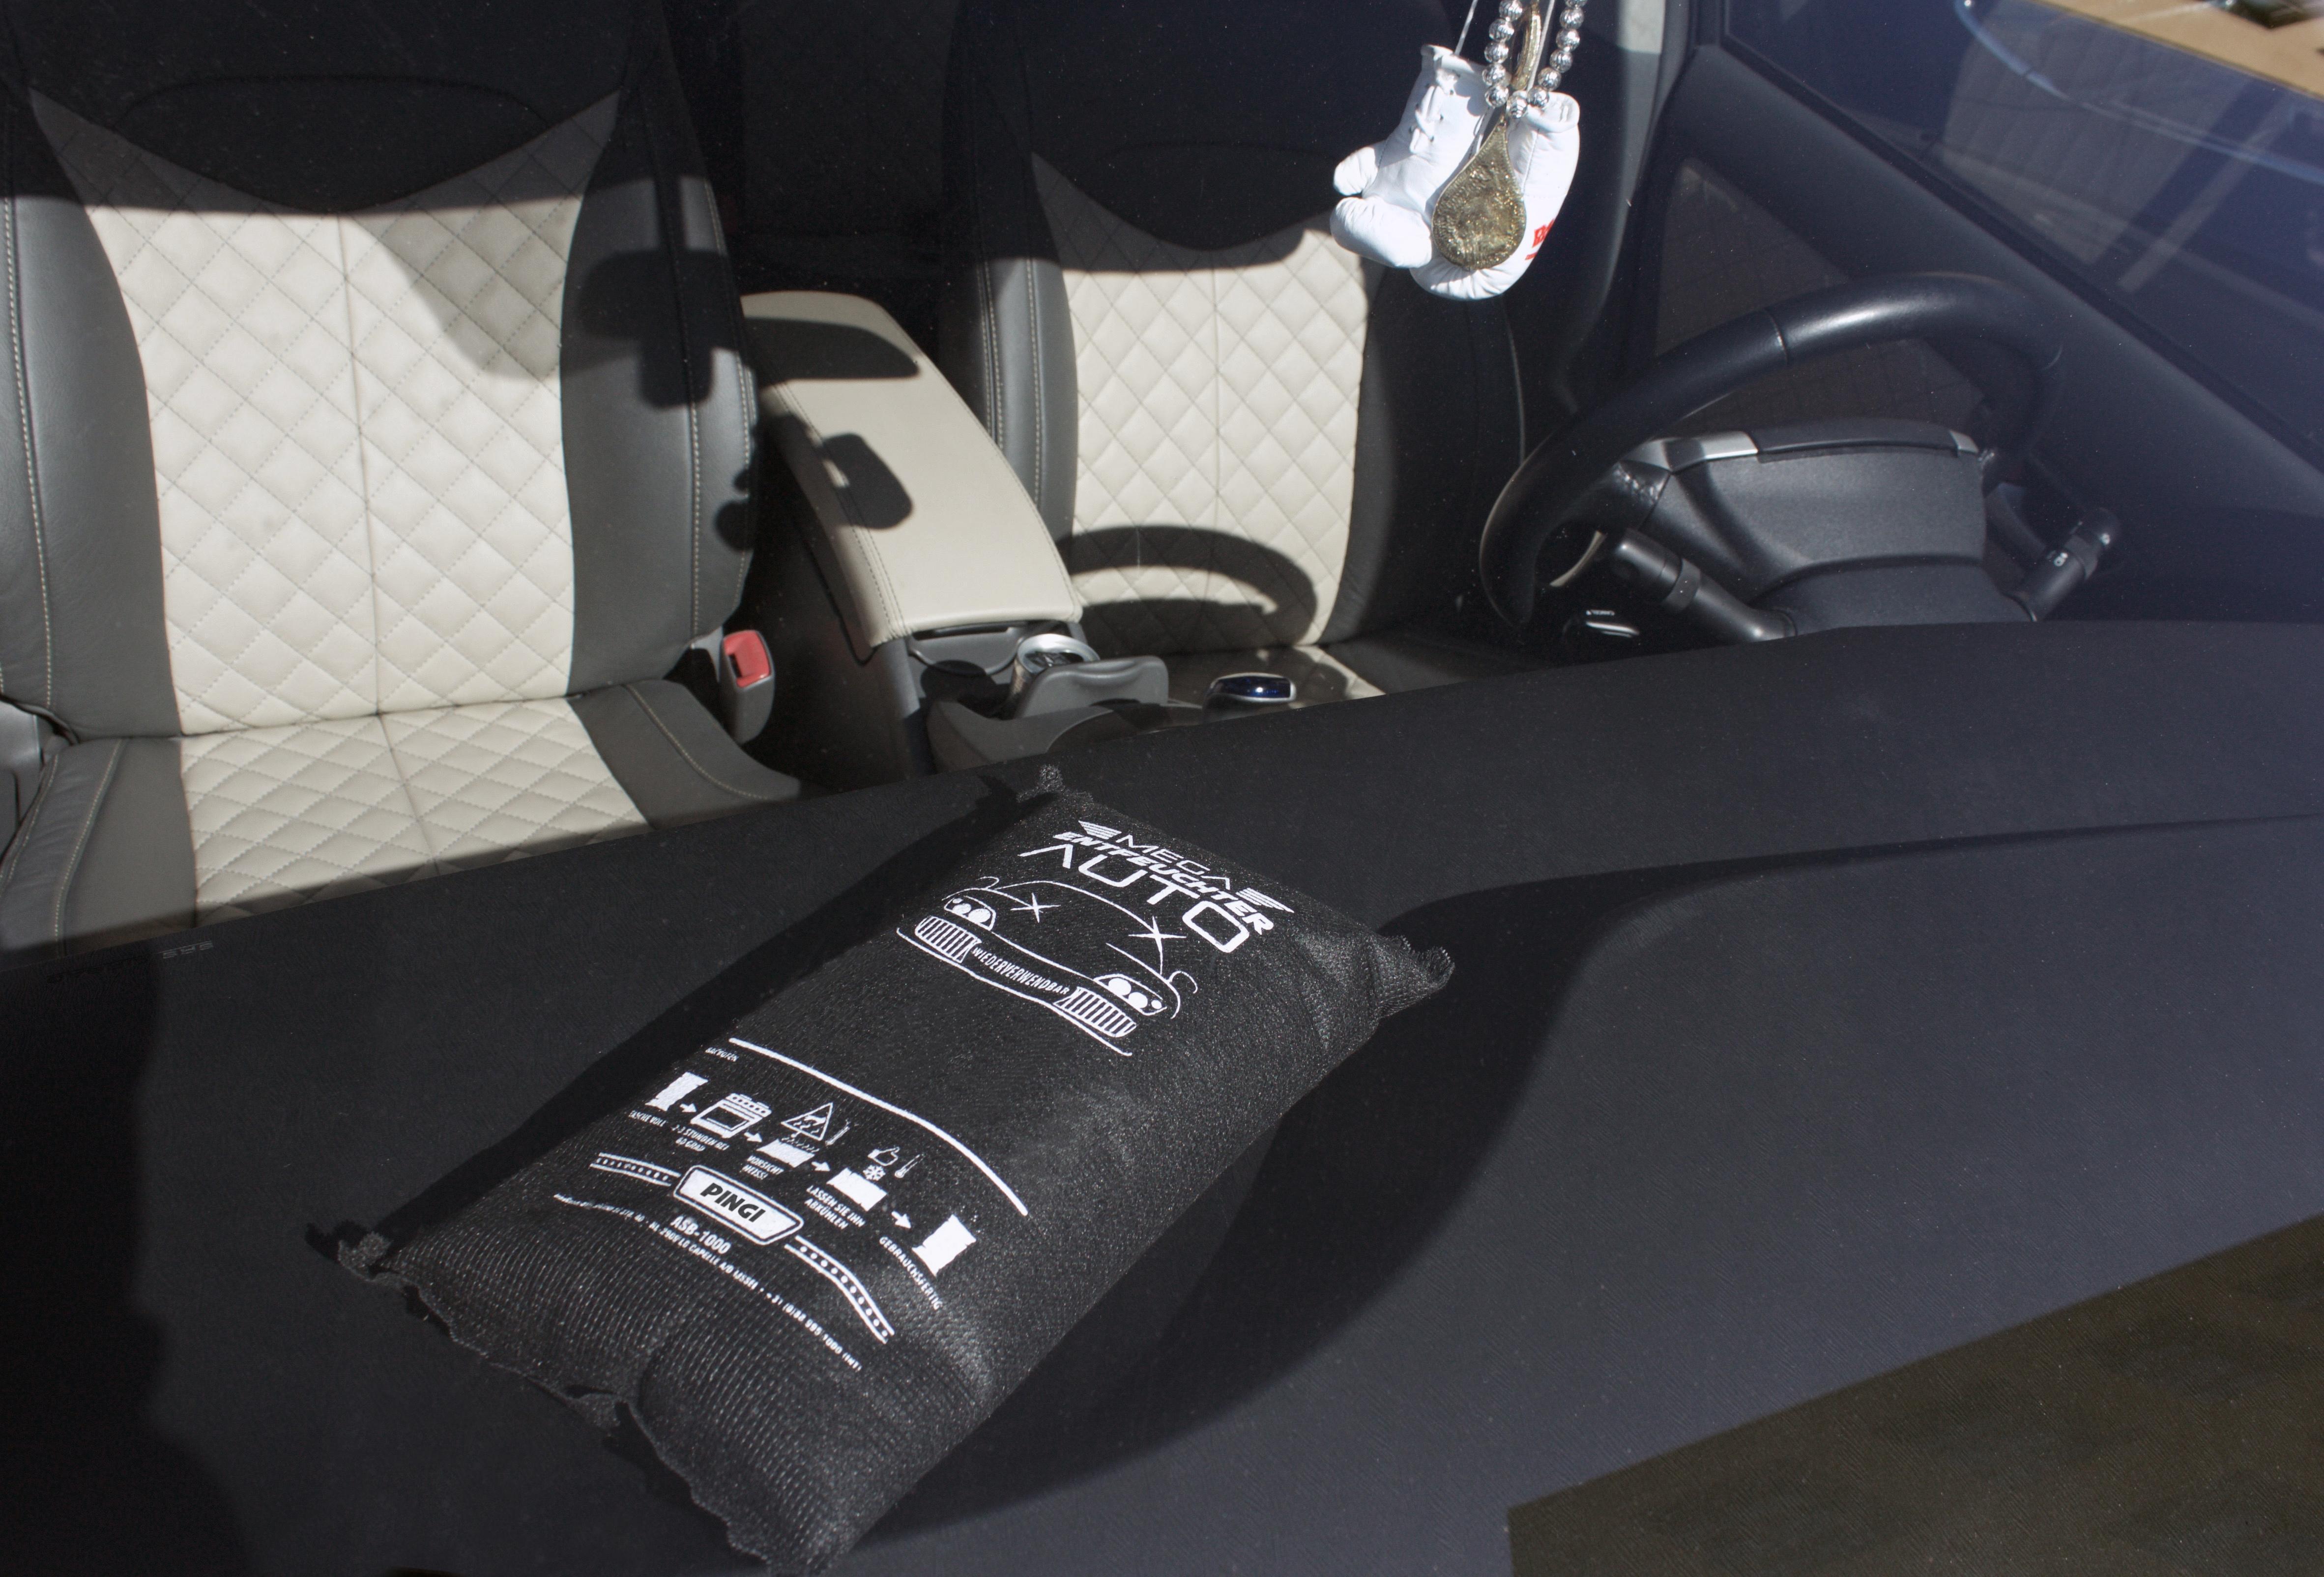 ASB-1000-DE Luftentfeuchterkissen PINGI - Markenprodukte billig